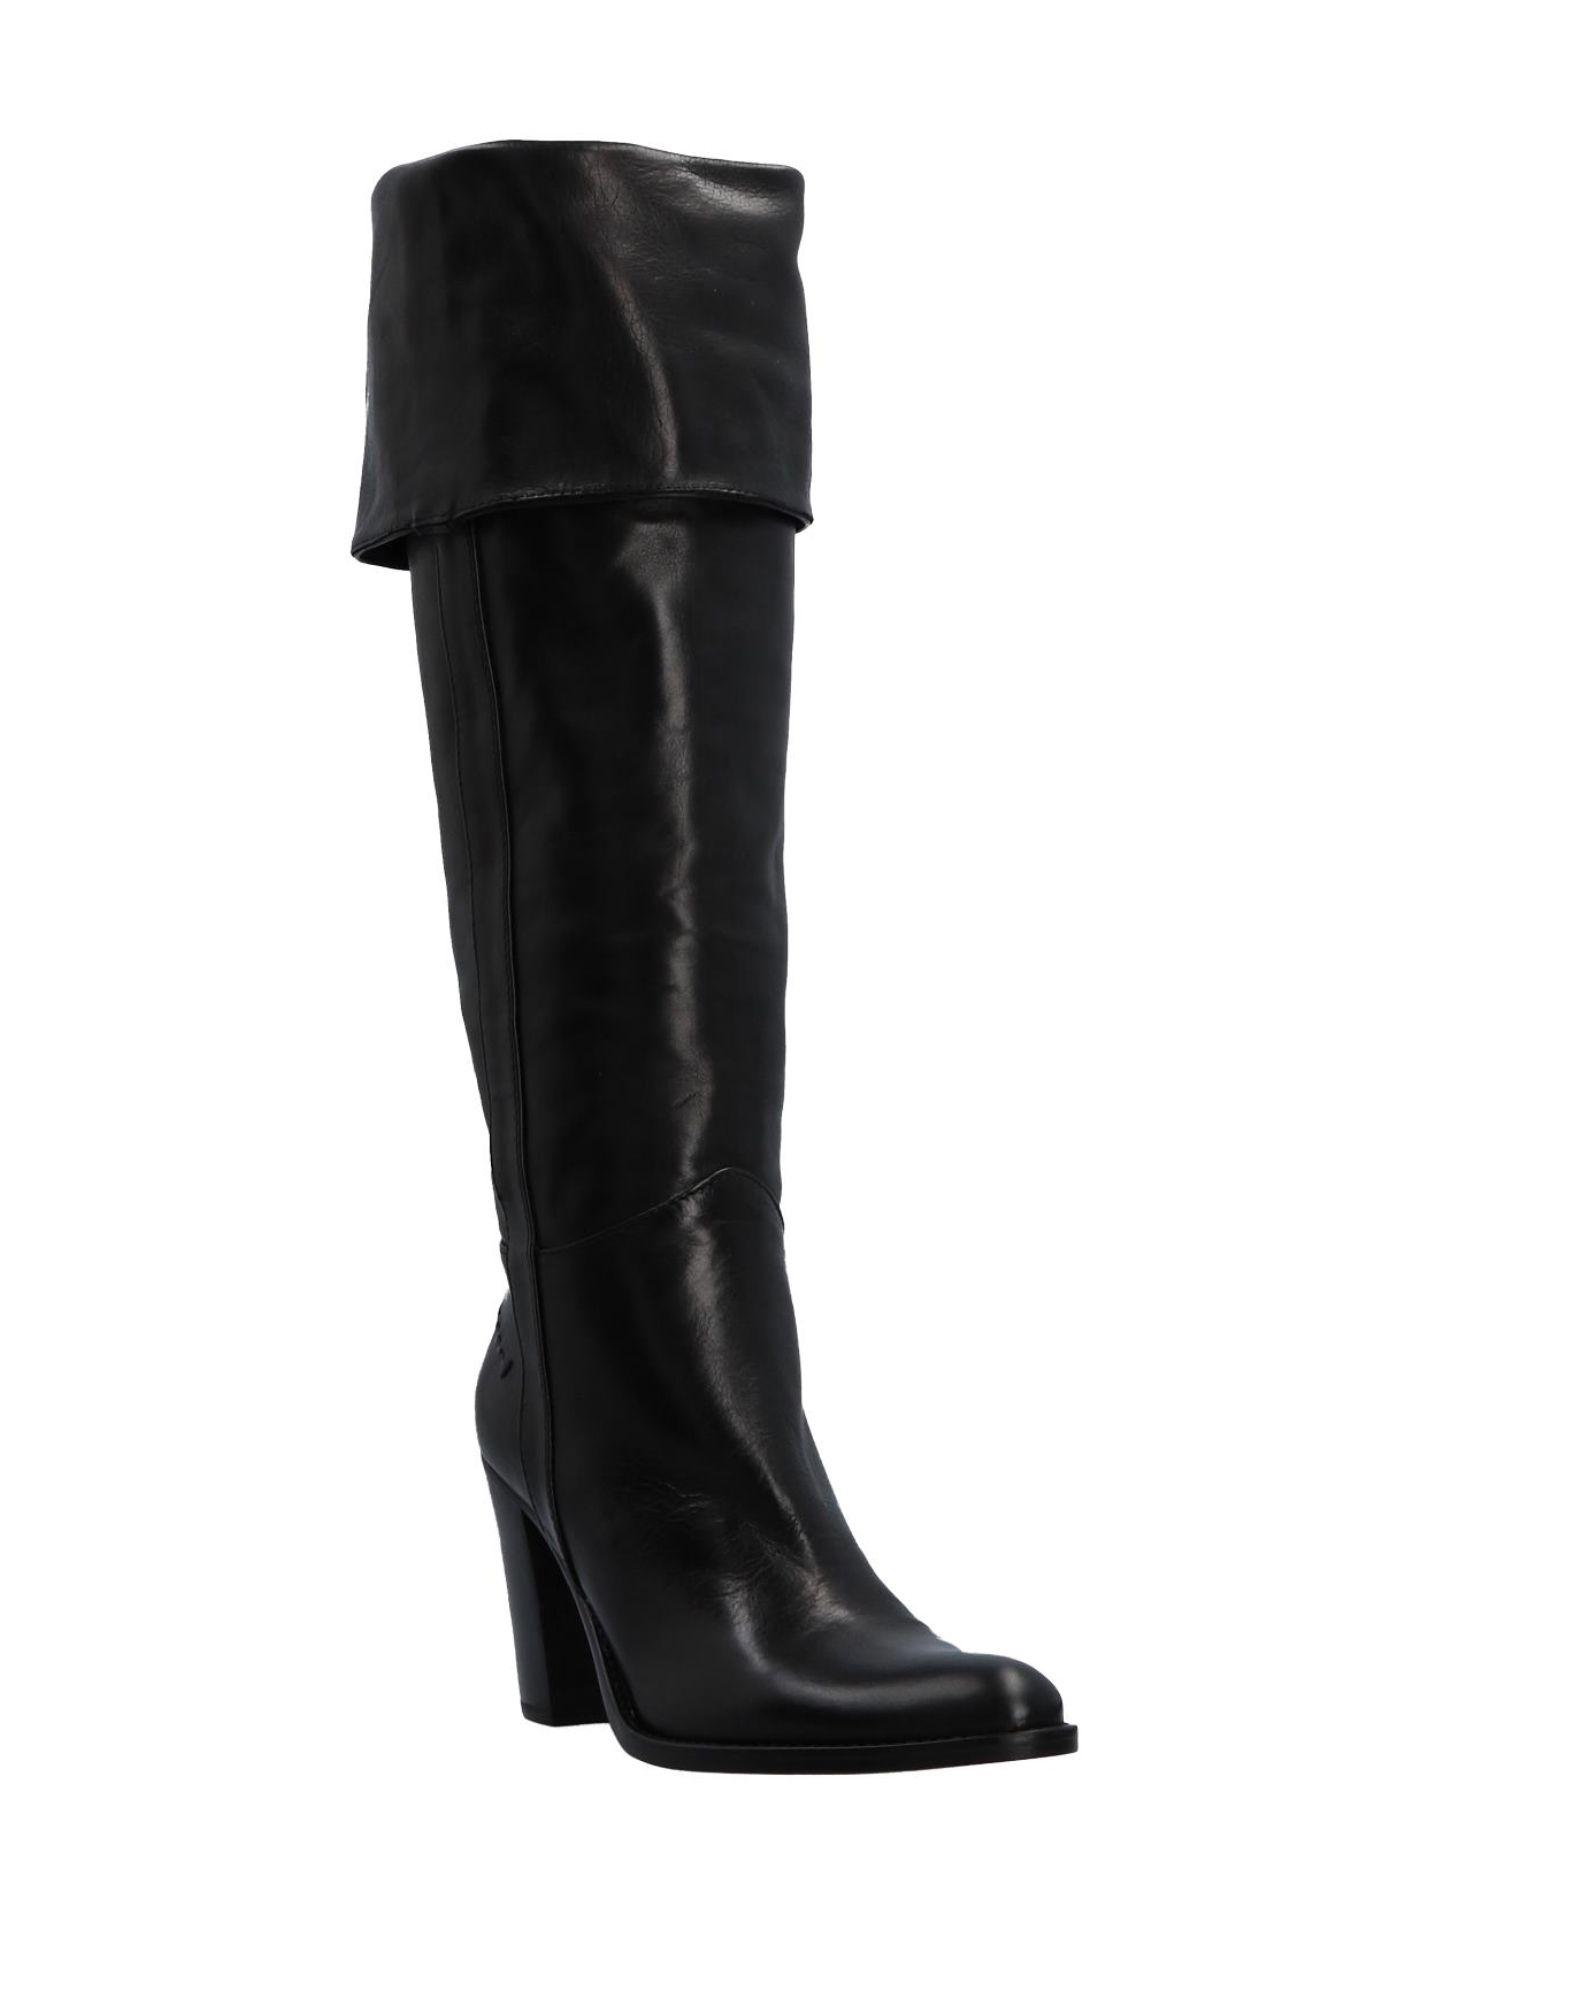 Lena Milos Stiefel Damen Beliebte  11520628CI Beliebte Damen Schuhe 4a783a